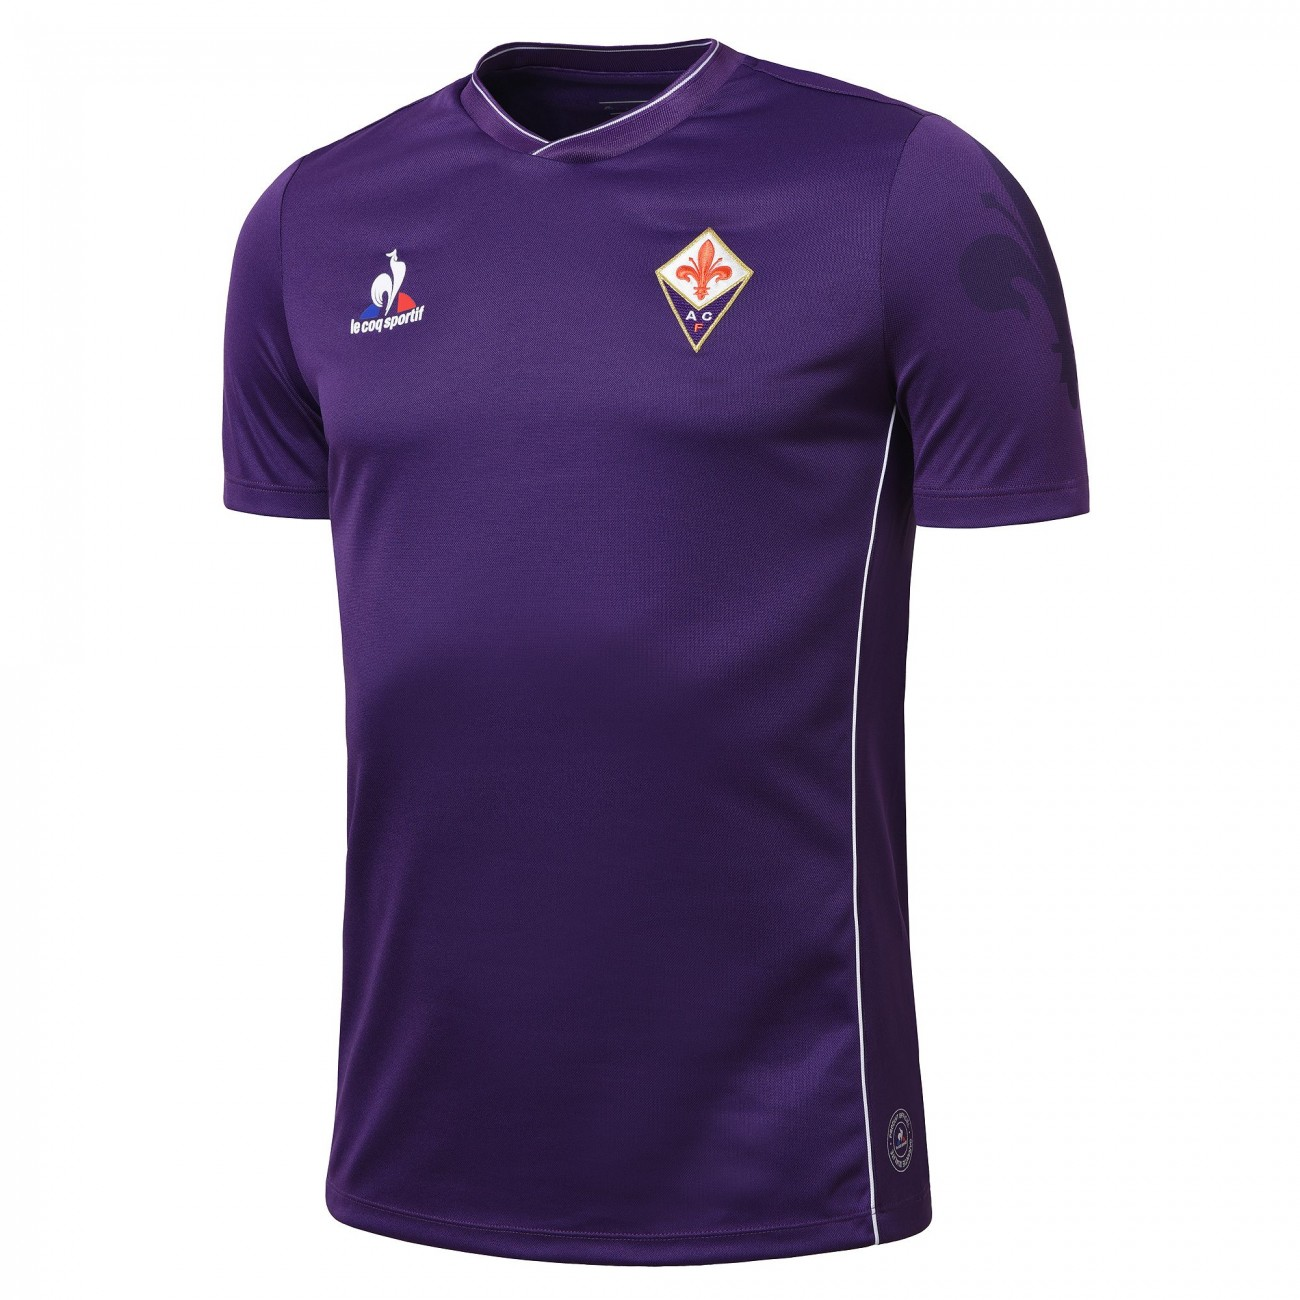 http://www.retrofootball.es/ropa-de-futbol/camiseta-fiorentina-2015-16.html